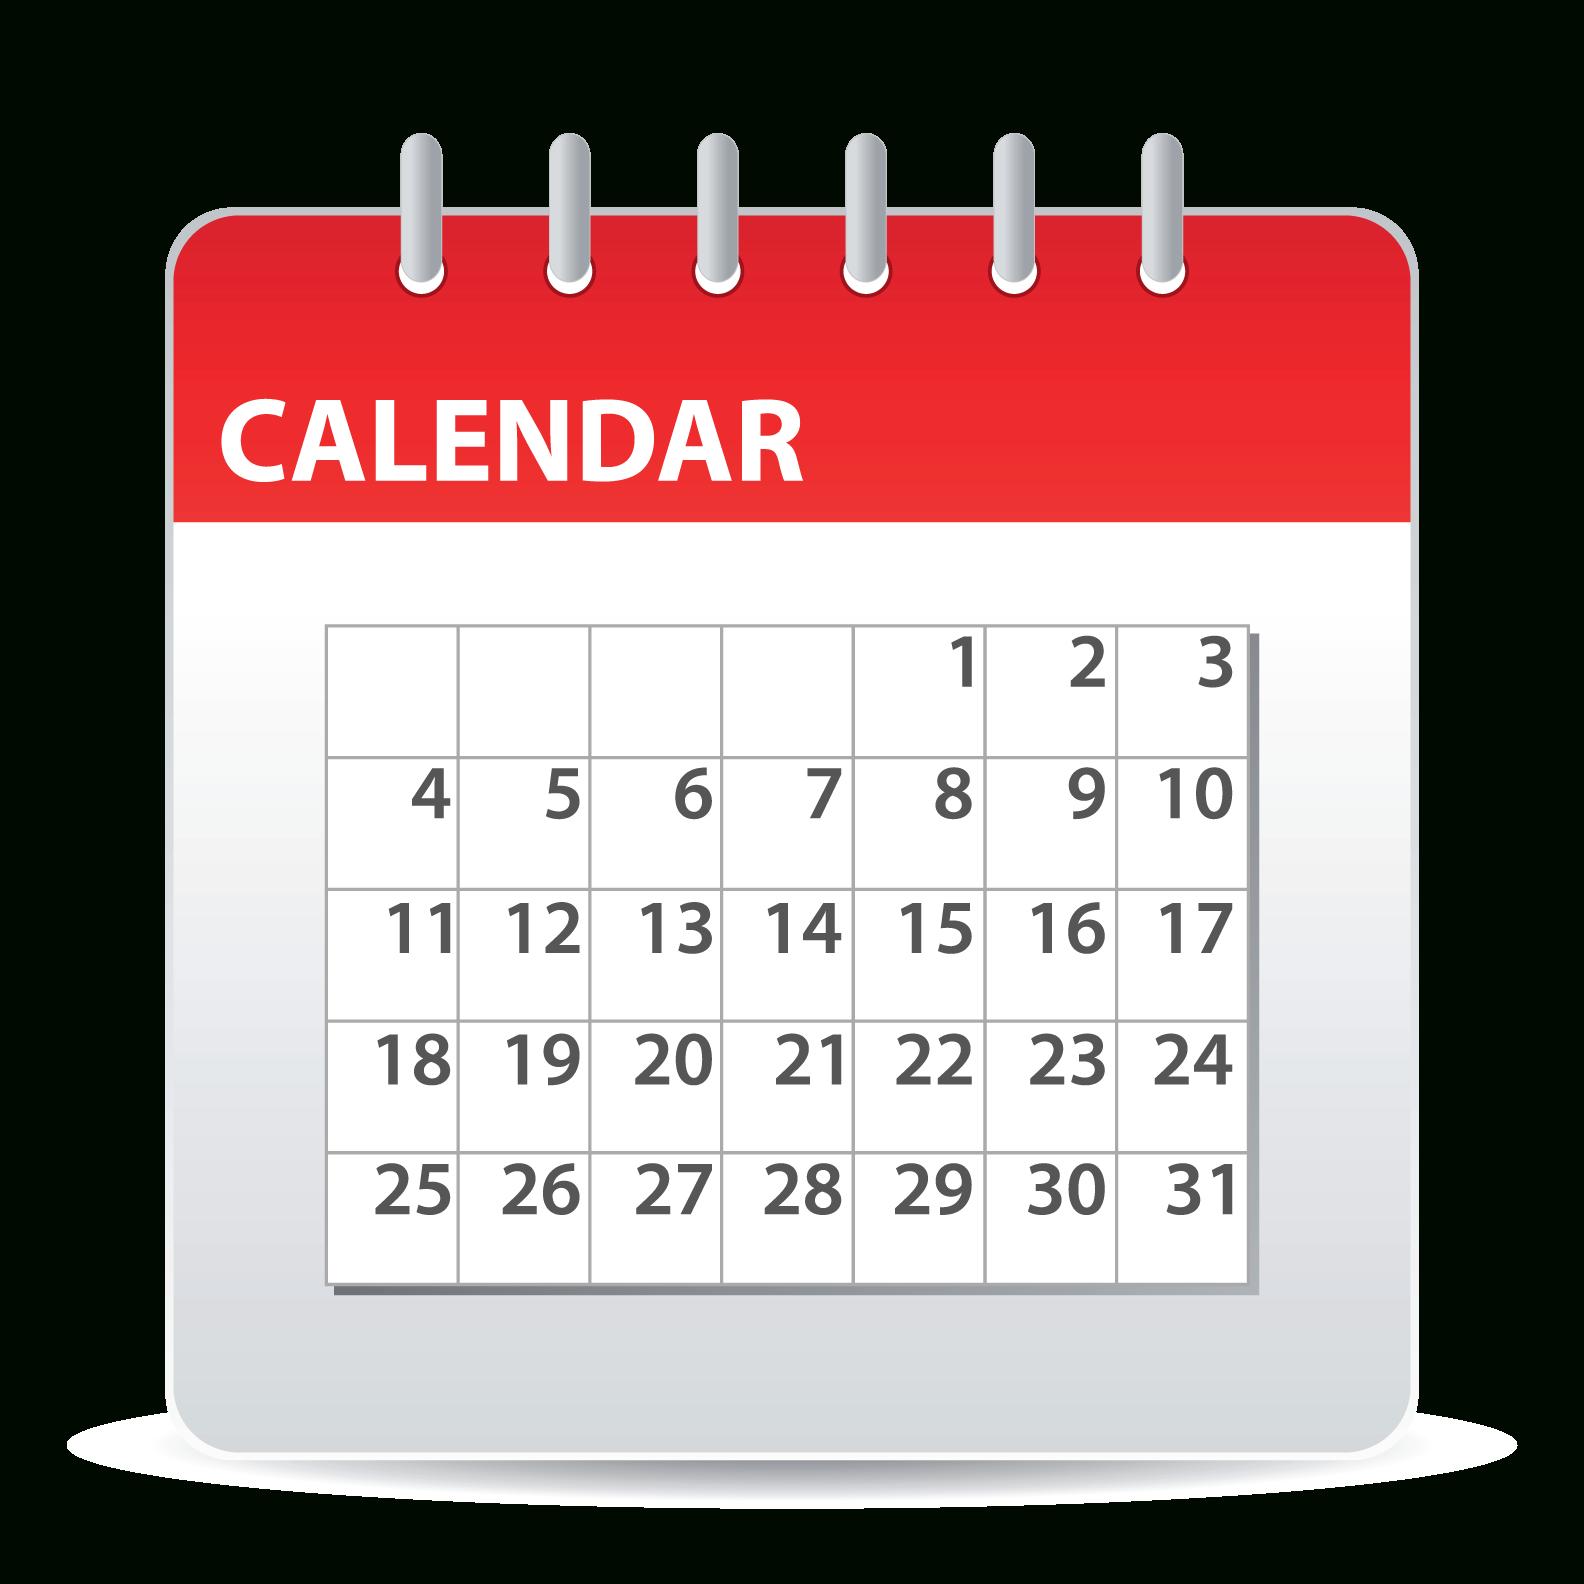 Clipart Calendar Emoji, Clipart Calendar Emoji Transparent pertaining to Calendar Emoji Png